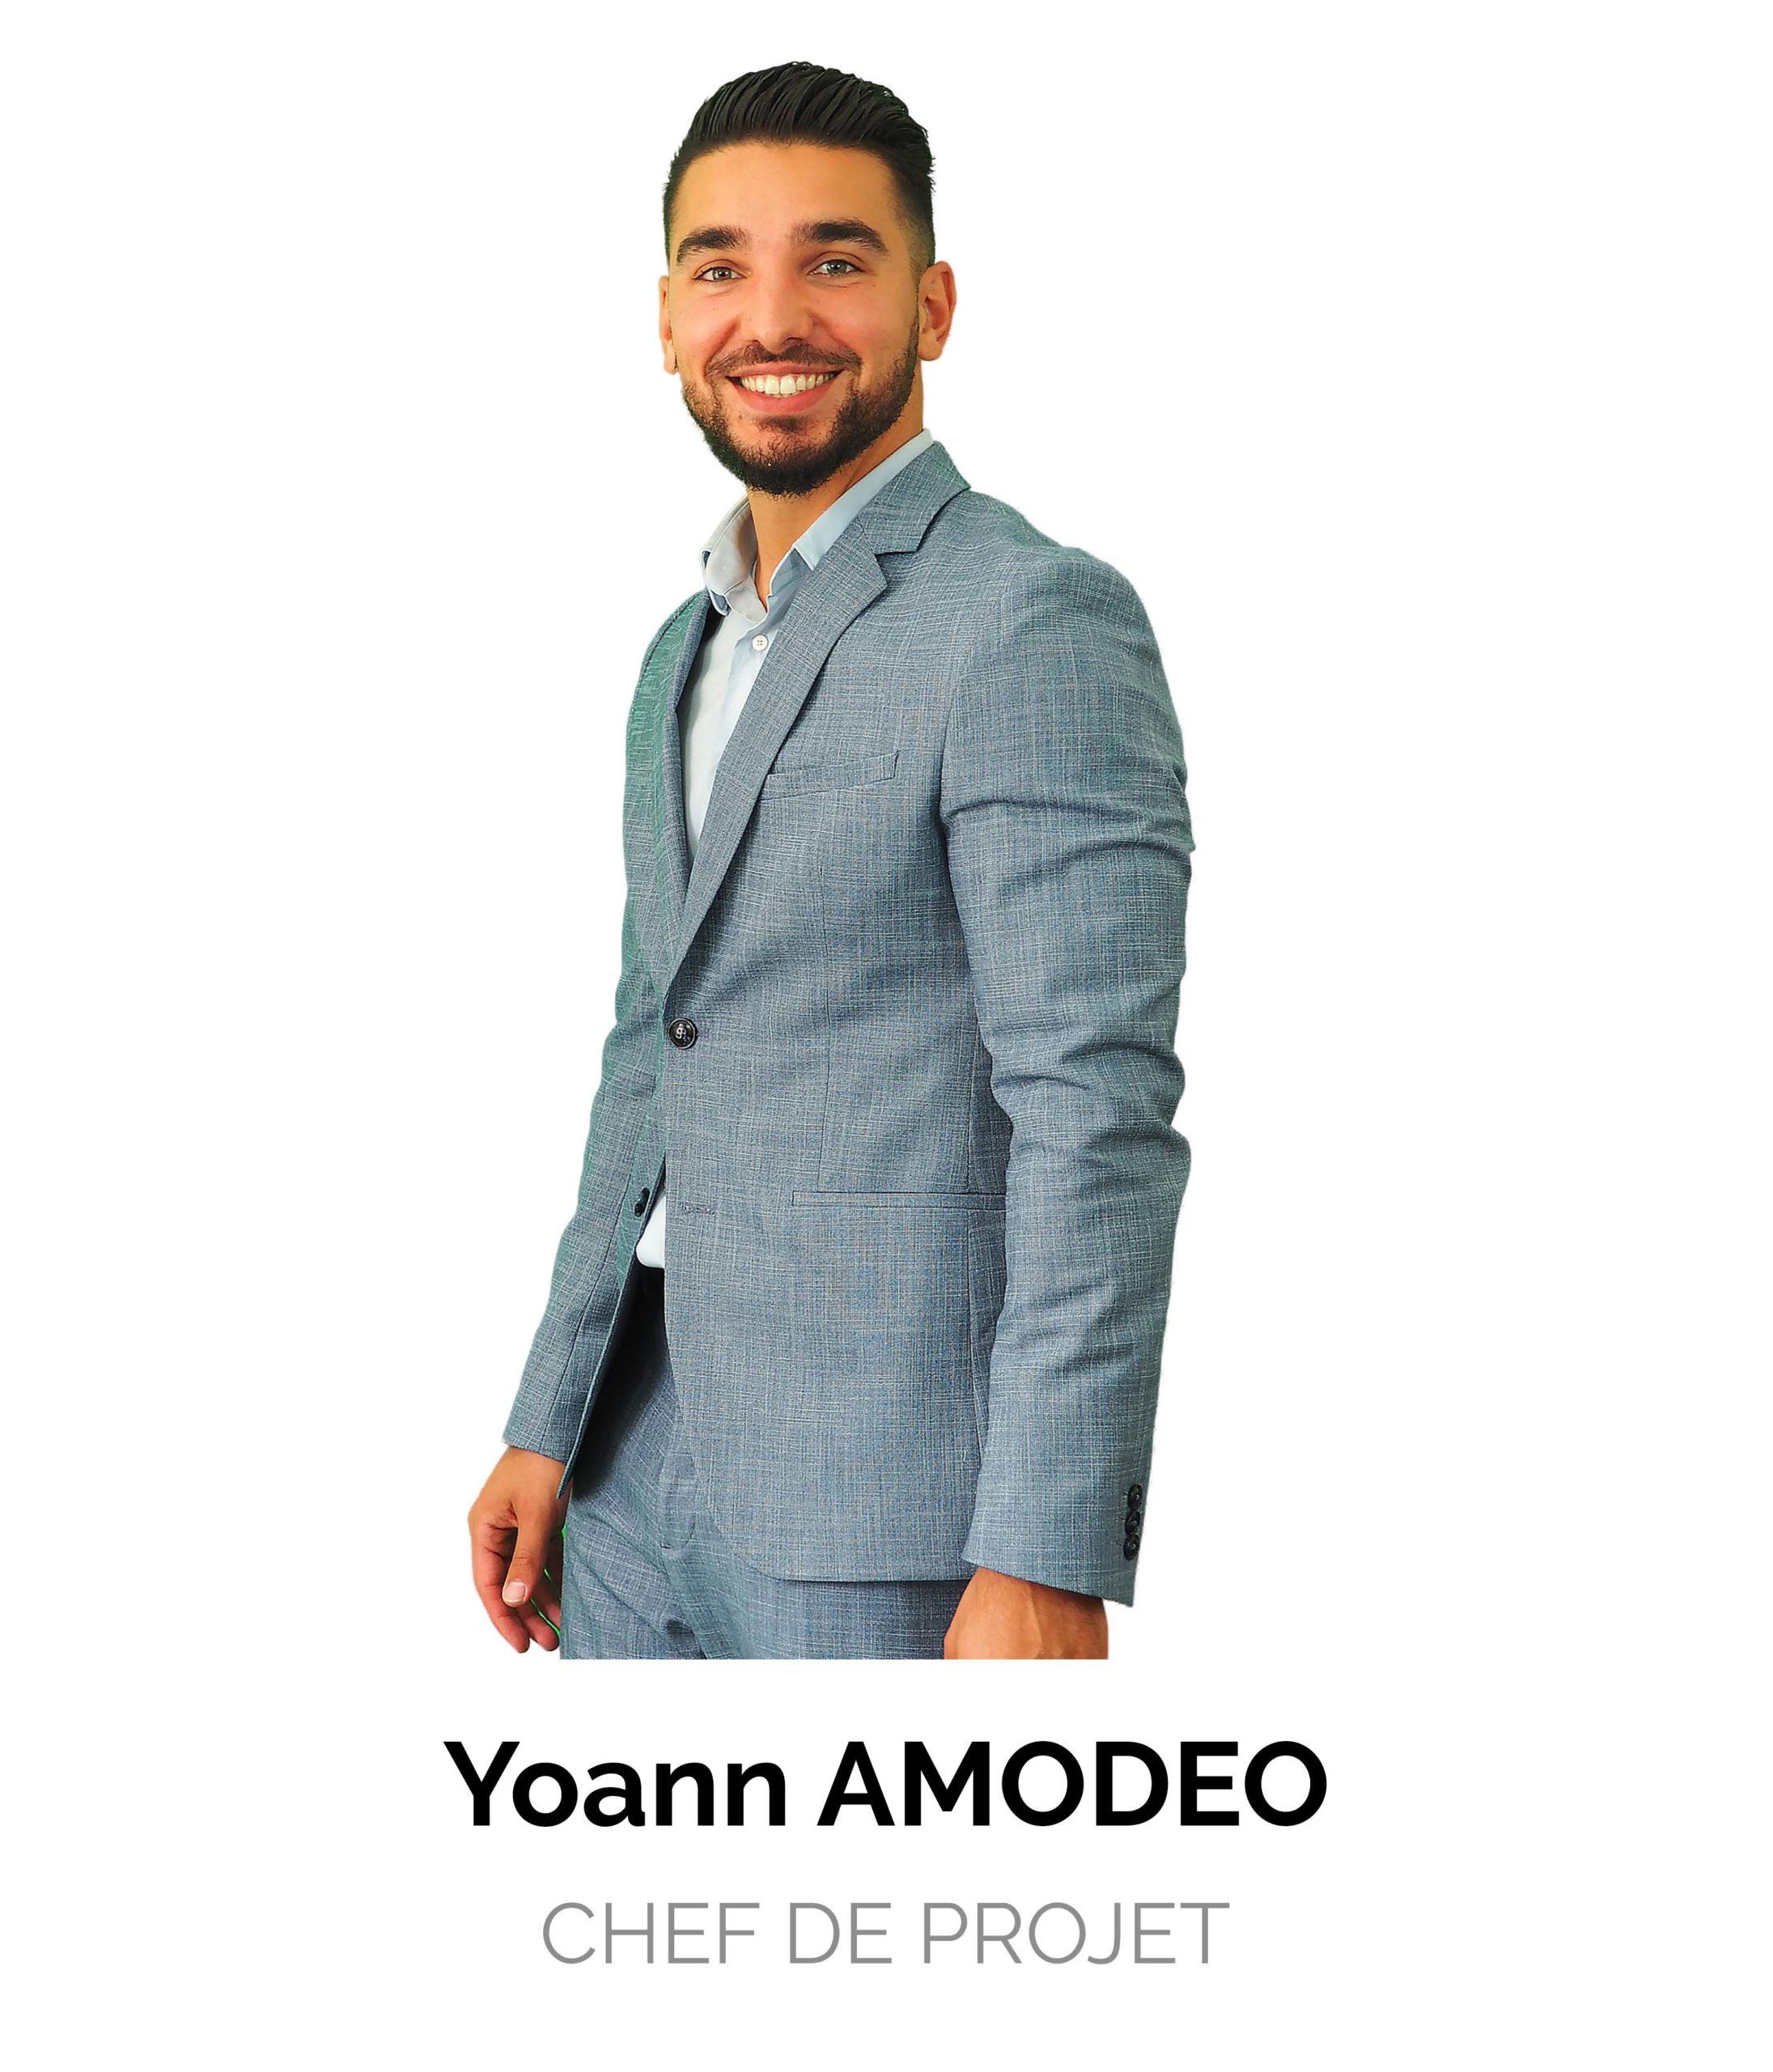 Yoann Amodeo Chef de Projet